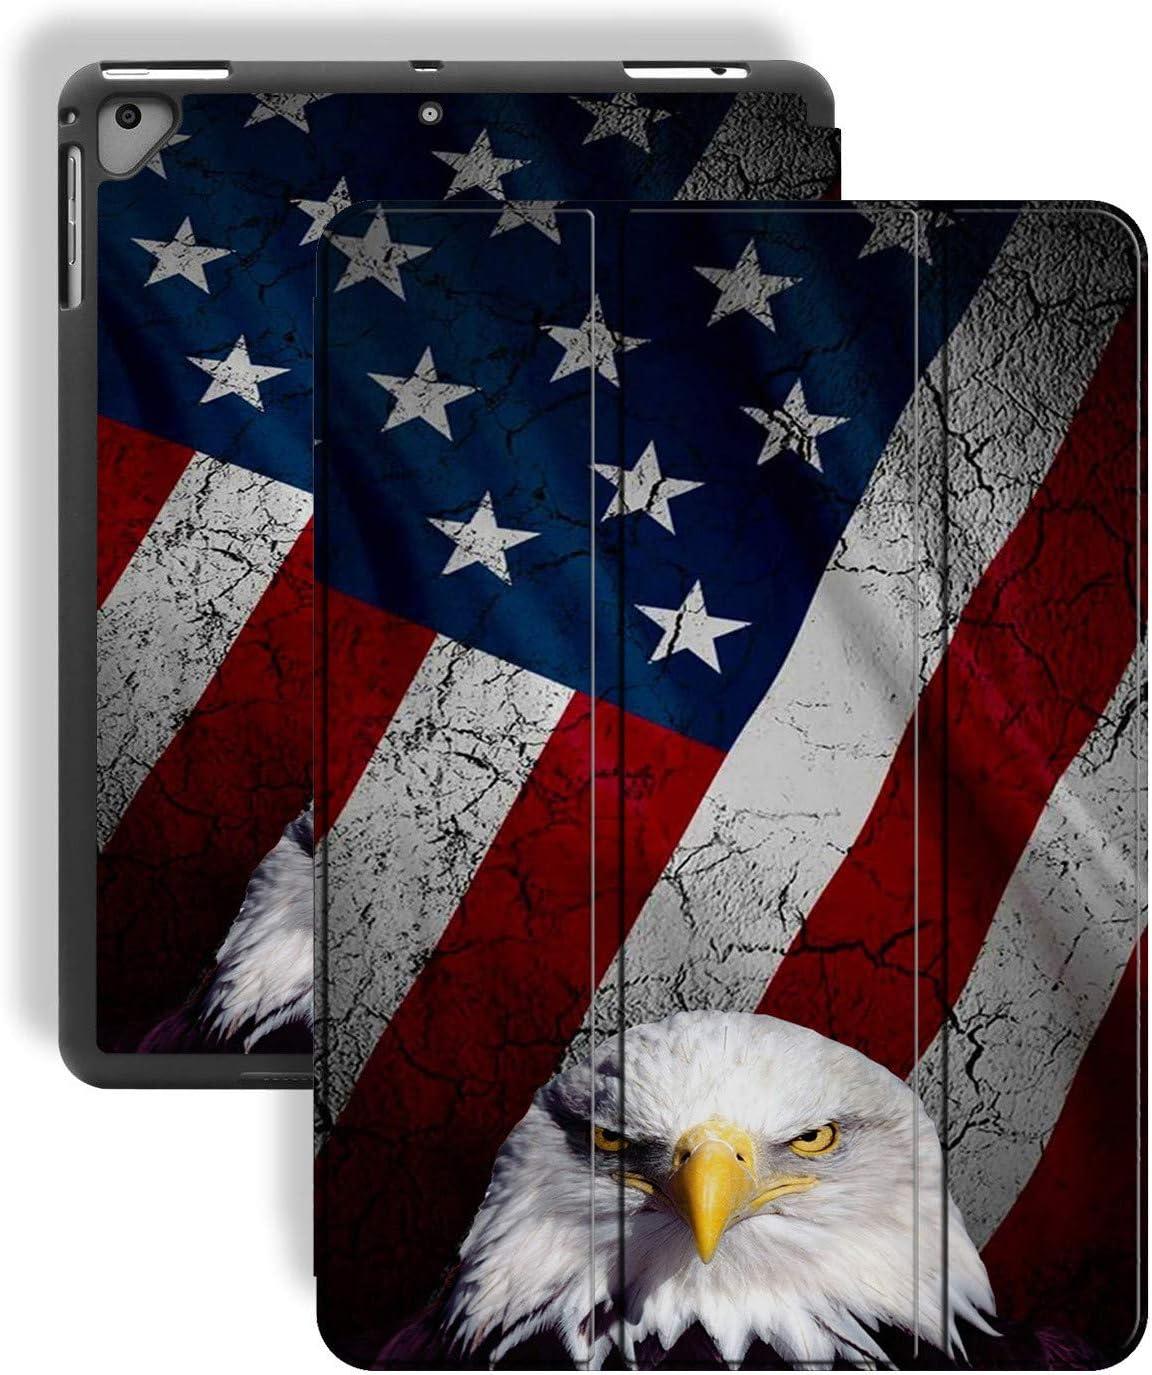 iPad 9.7 2018 2017 Air 2021 new 2 Eagle Discount mail order Case Patt Flag American Bald